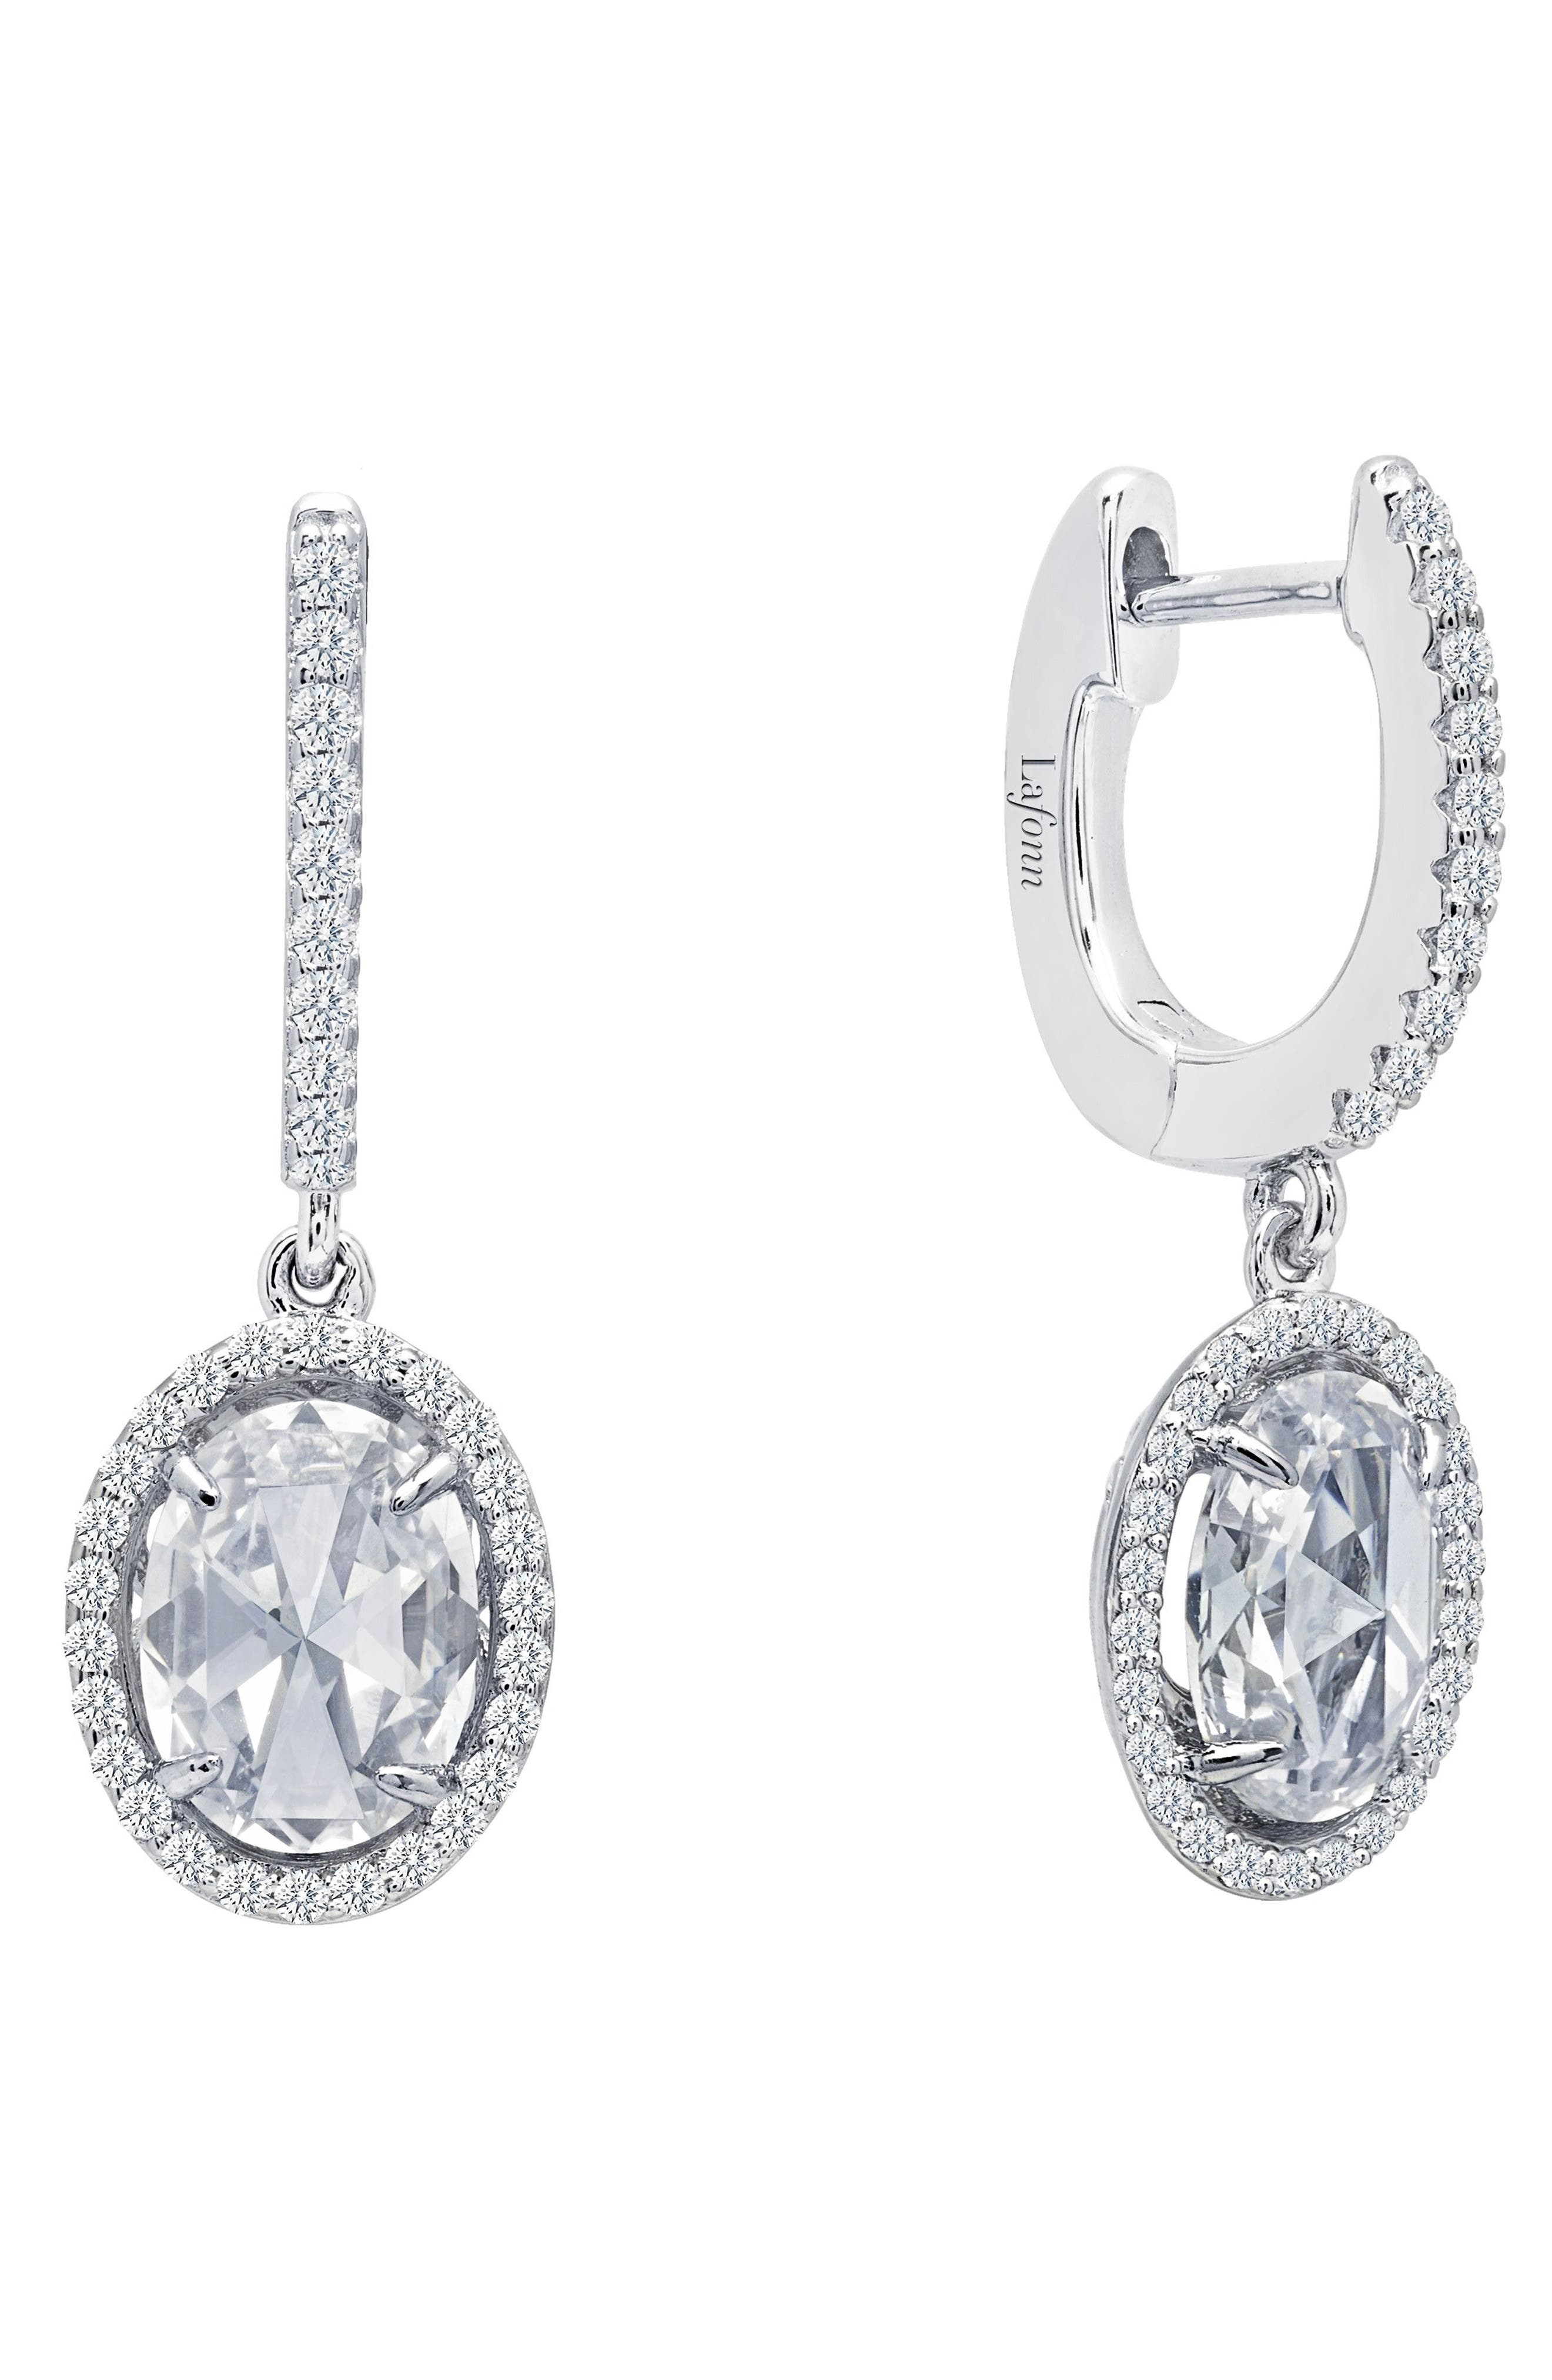 Simulated Diamond Drop Earrings,                         Main,                         color, Silver